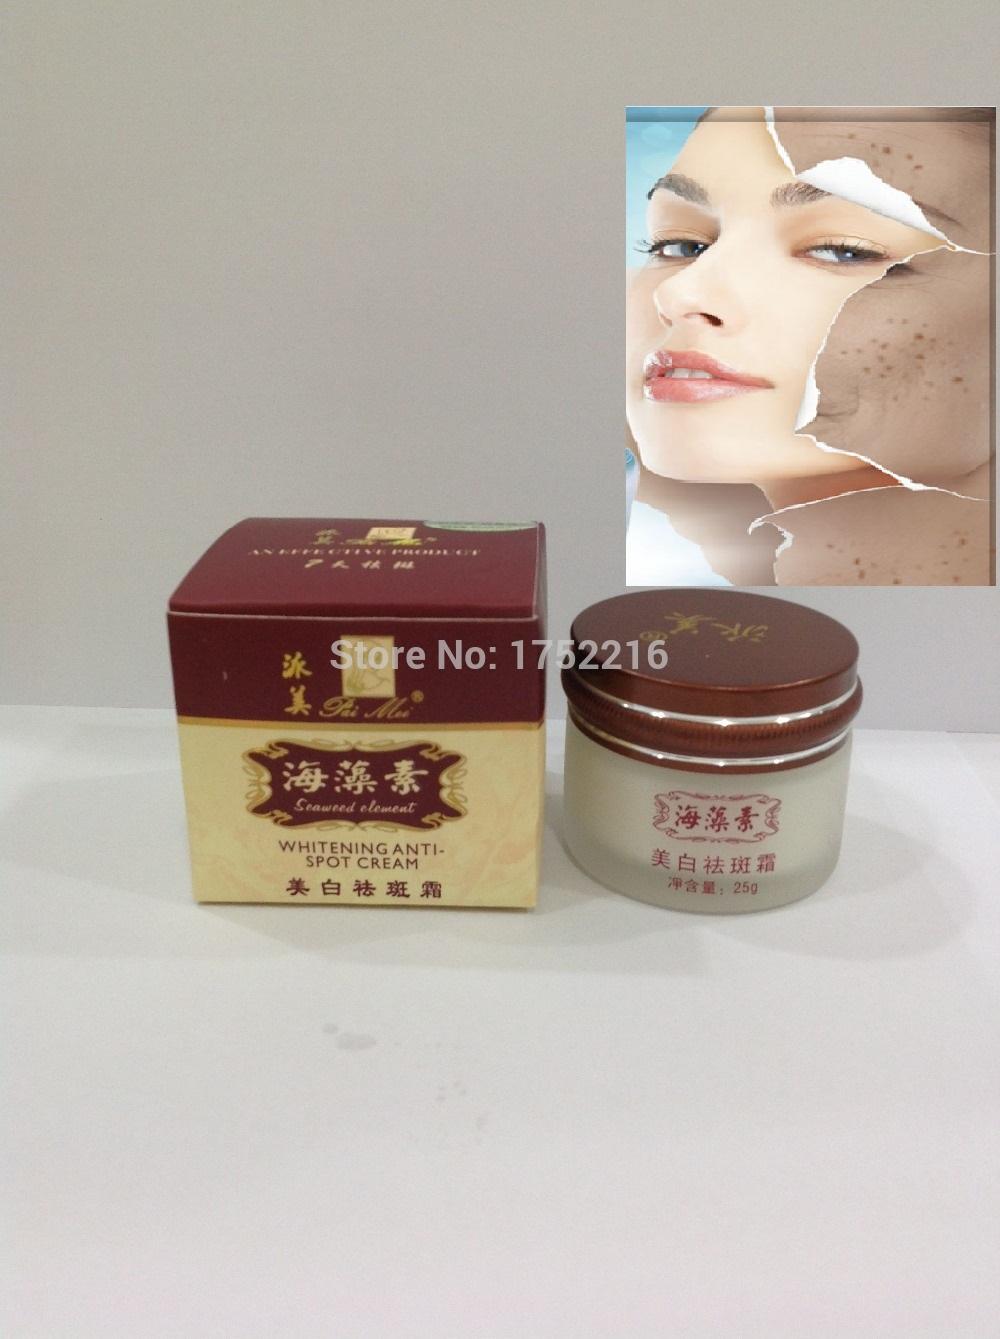 7DAYS PAI MEI Best Lightening Whitening Skin Cream Remove Dark Skin Spots pai mei whitening cream for face remove pigmen(China (Mainland))